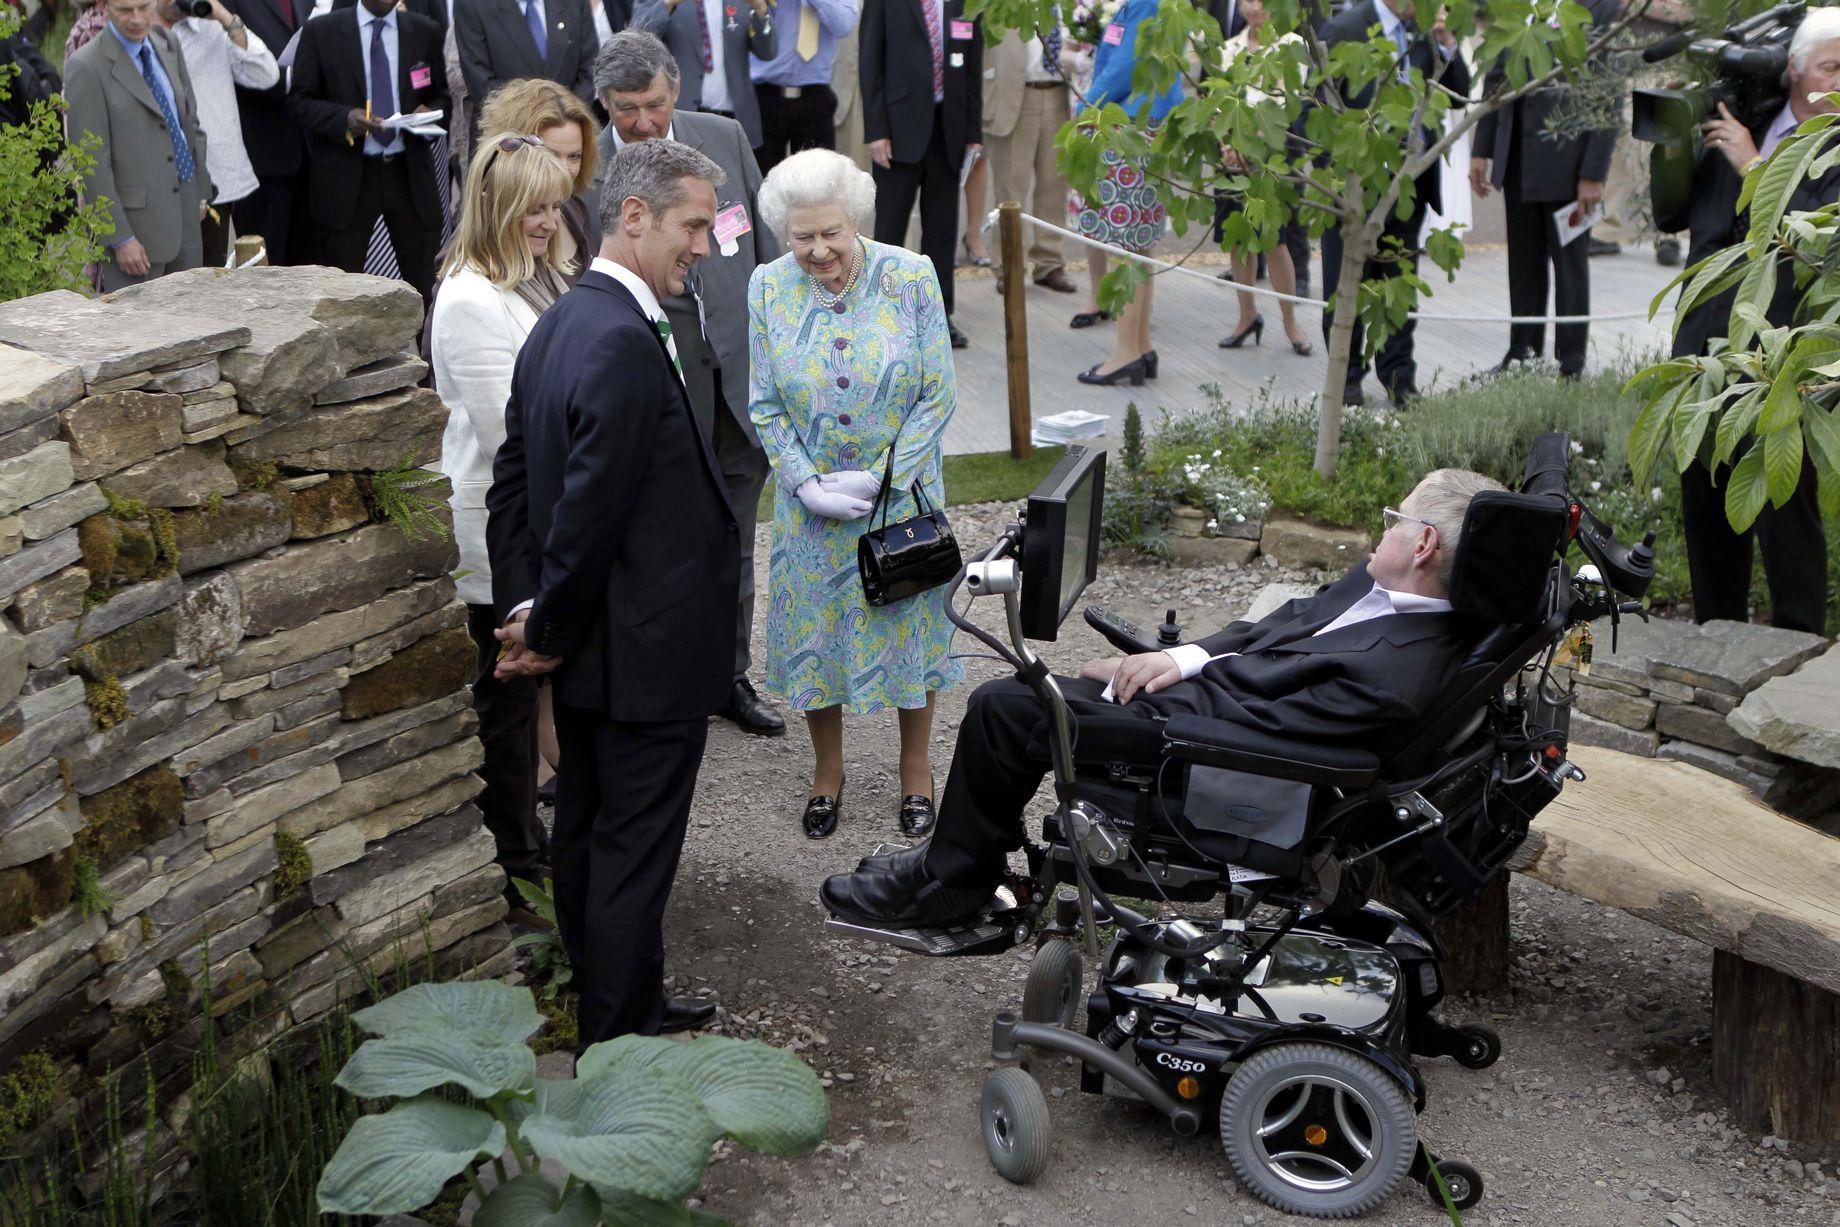 Stephen-Hawking-1-12_mbuuio স্টিফেন হকিং এখন নয় ৩৩ বছর আগেই মারা গেছেন!